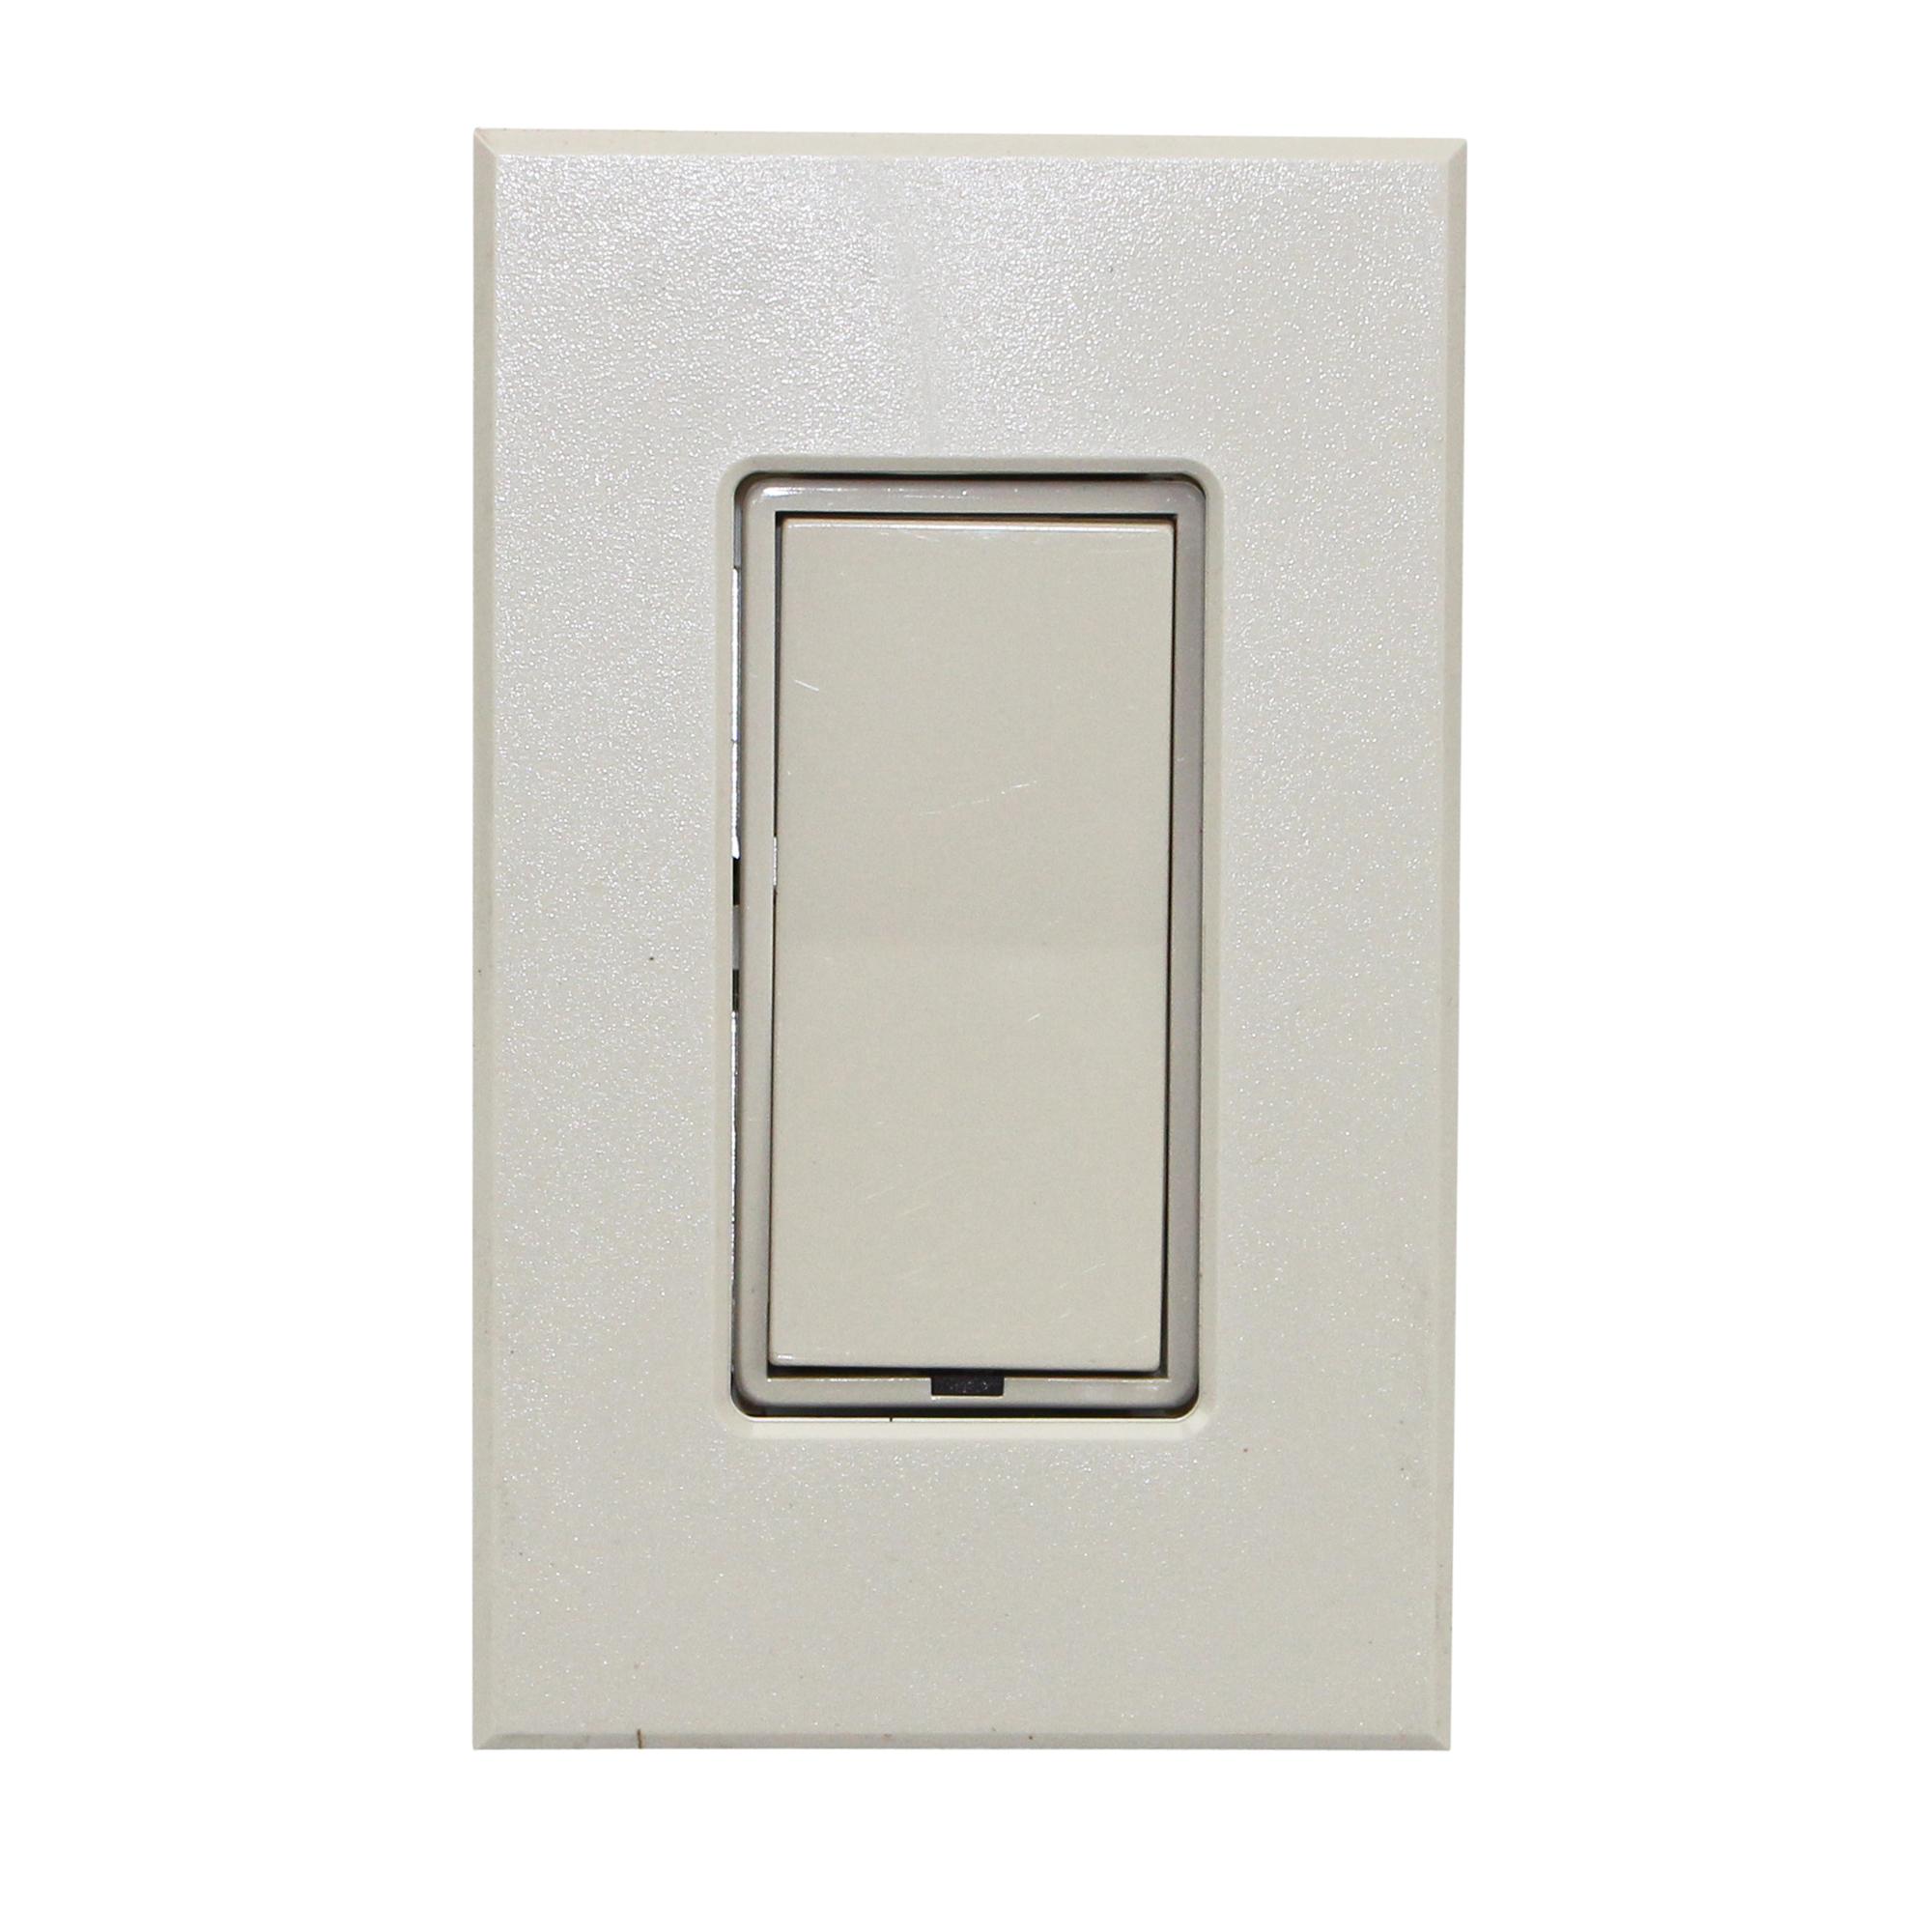 itsrbla intellisight occupancy sensor switch 120 277v light almond. Black Bedroom Furniture Sets. Home Design Ideas